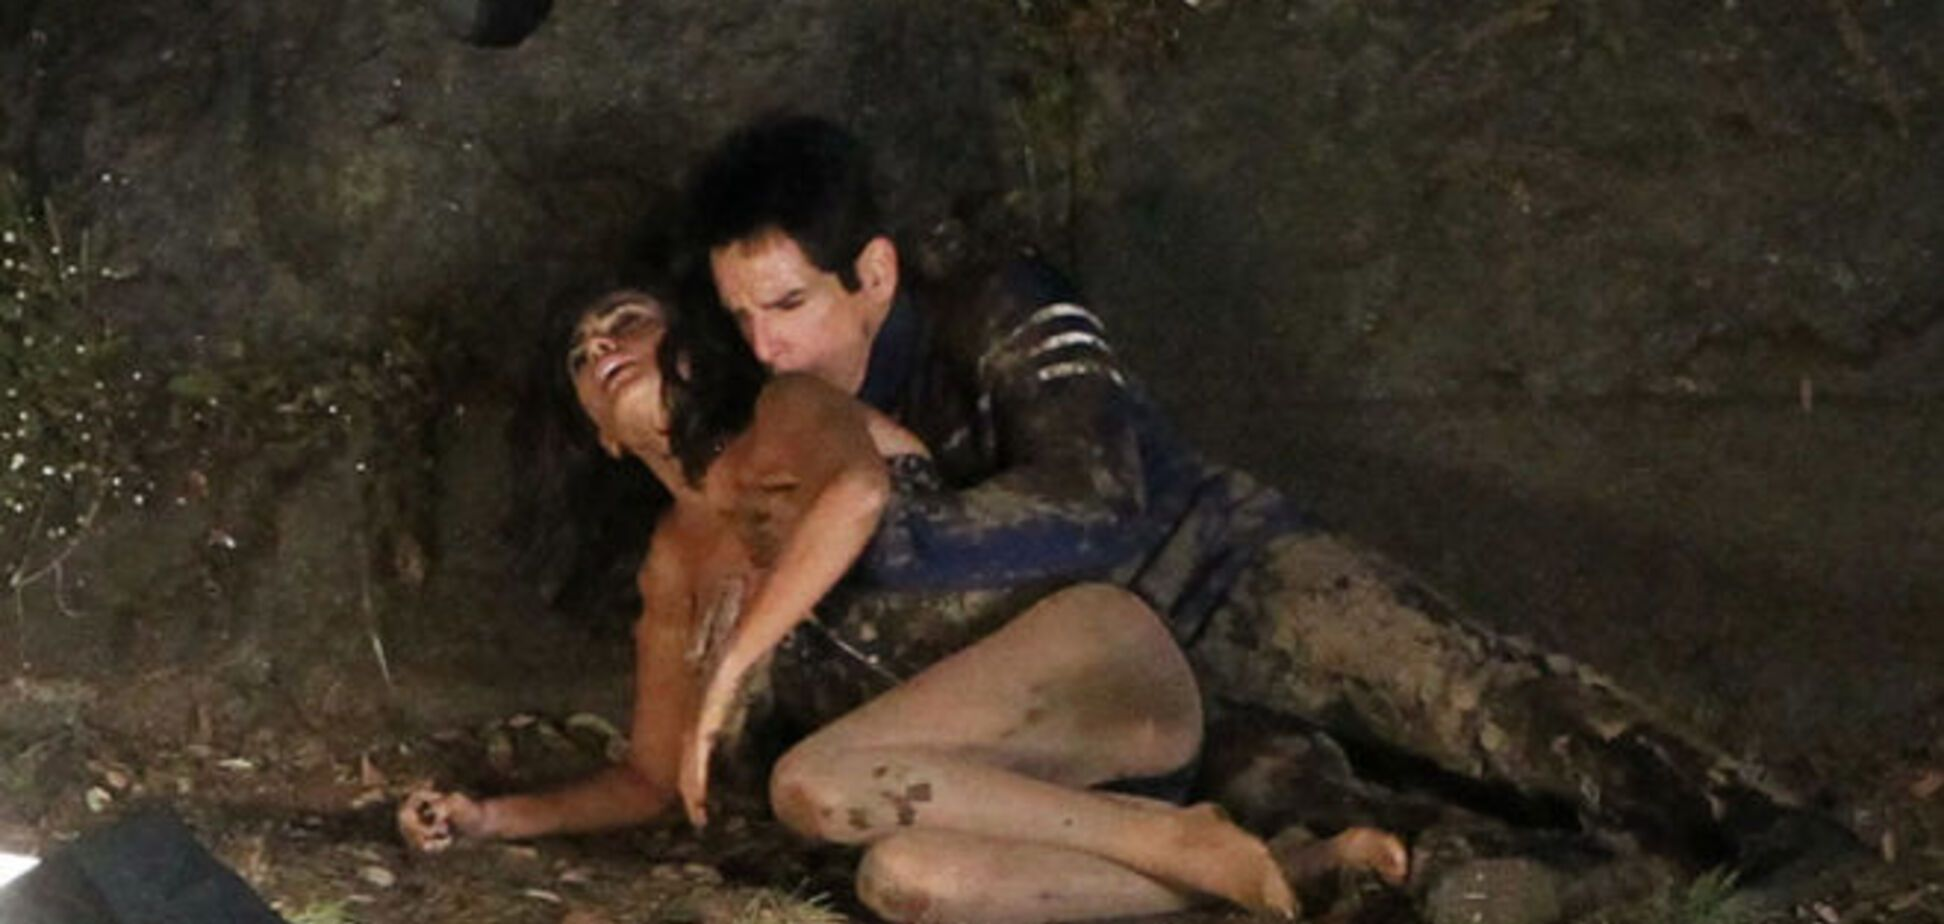 Бен Стиллер обласкал грудь Пенелопы Крус в грязи: фотофакт